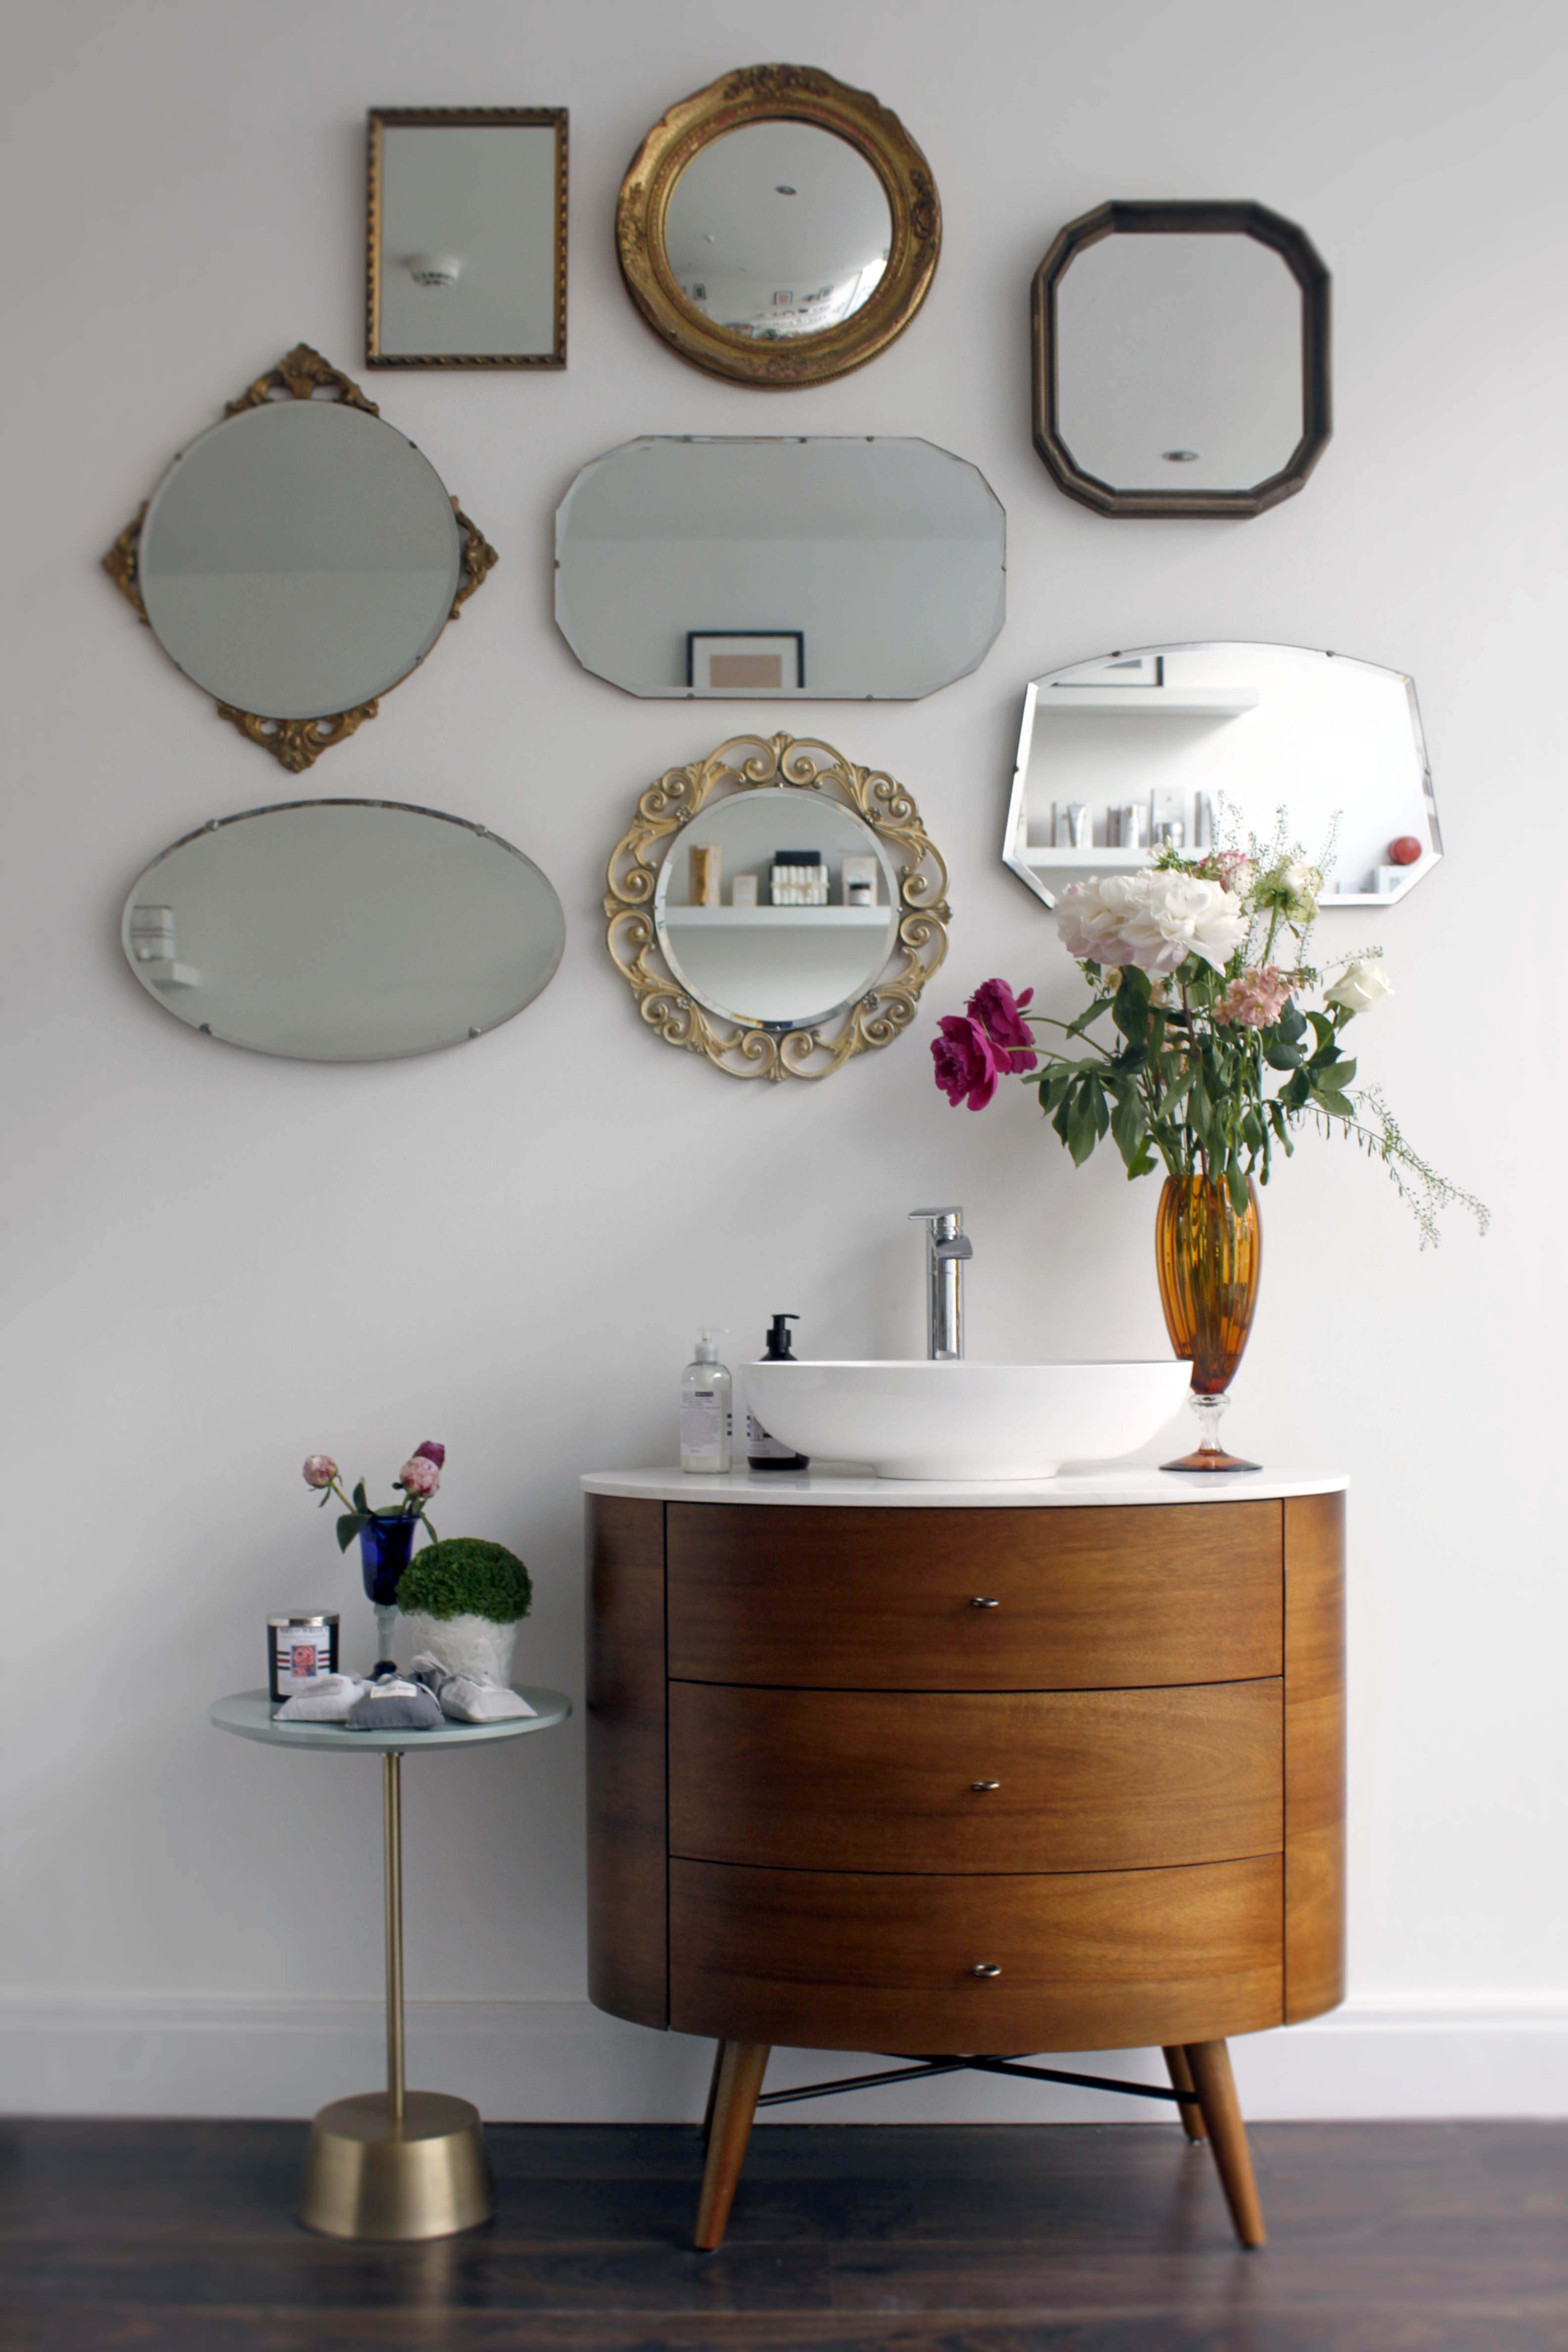 mirror_wall